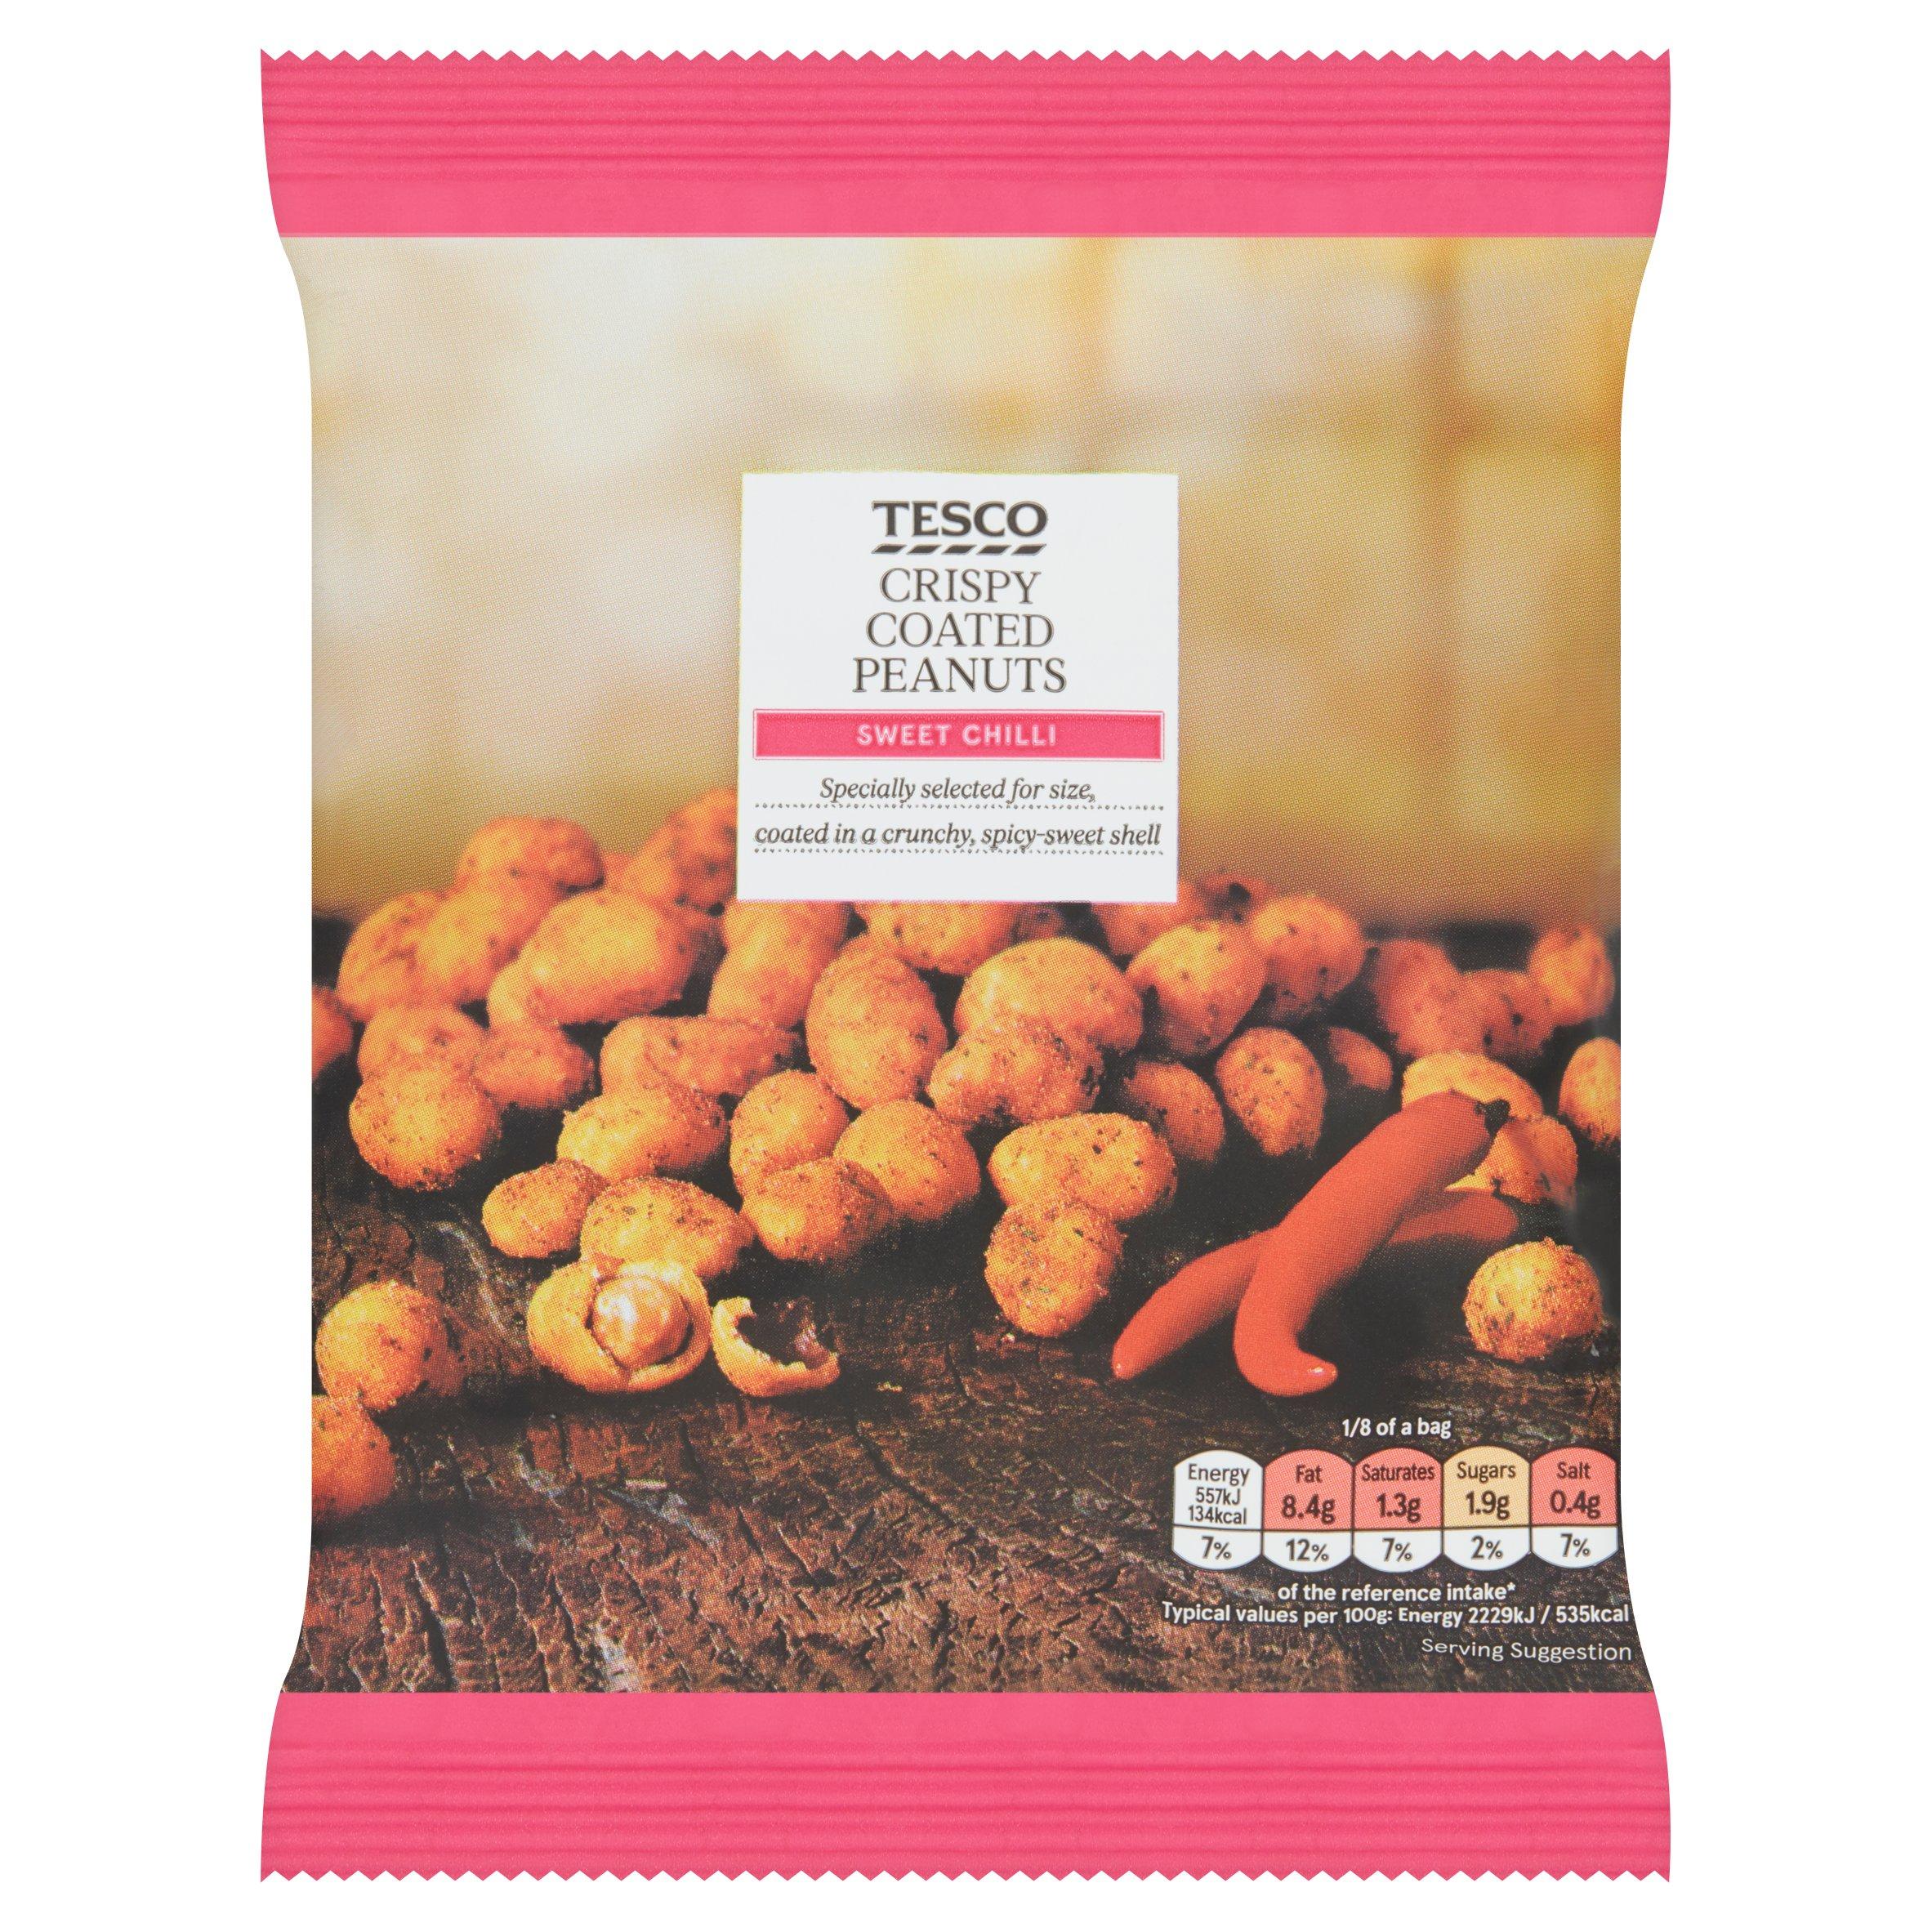 Tesco Sweet Chilli Coated Peanuts 200G